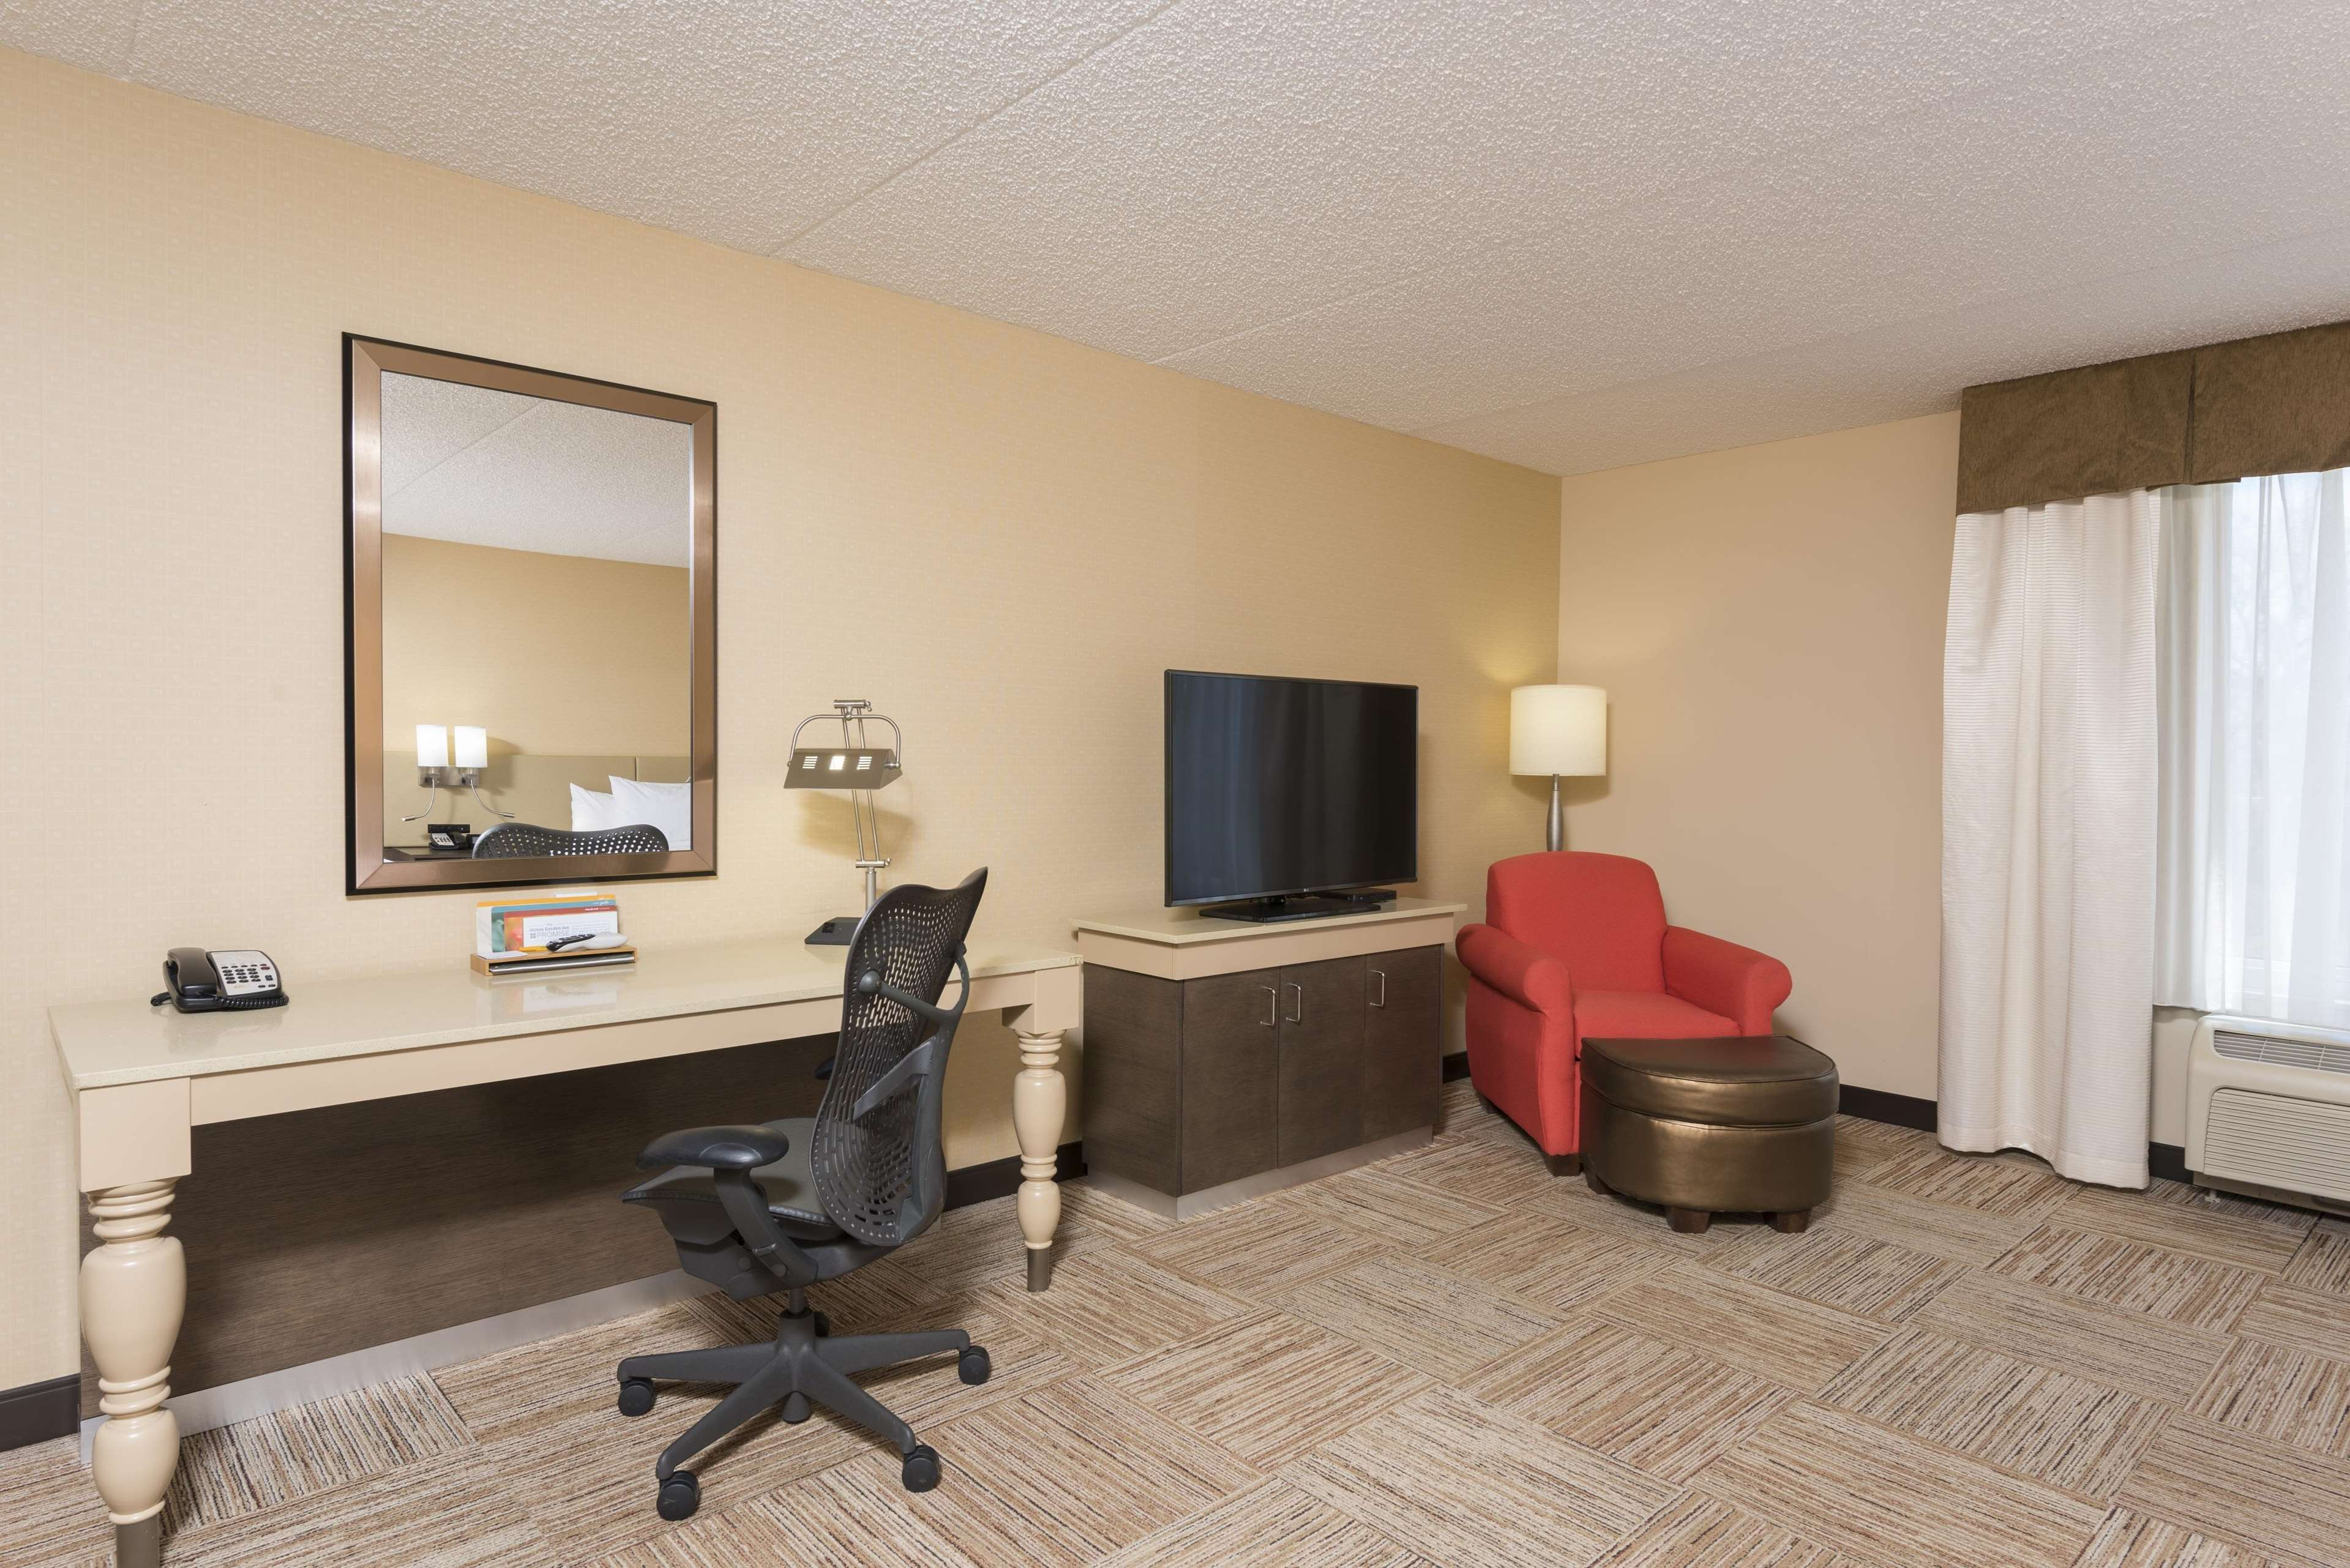 Hilton Garden Inn West Lafayette Wabash Landing image 14